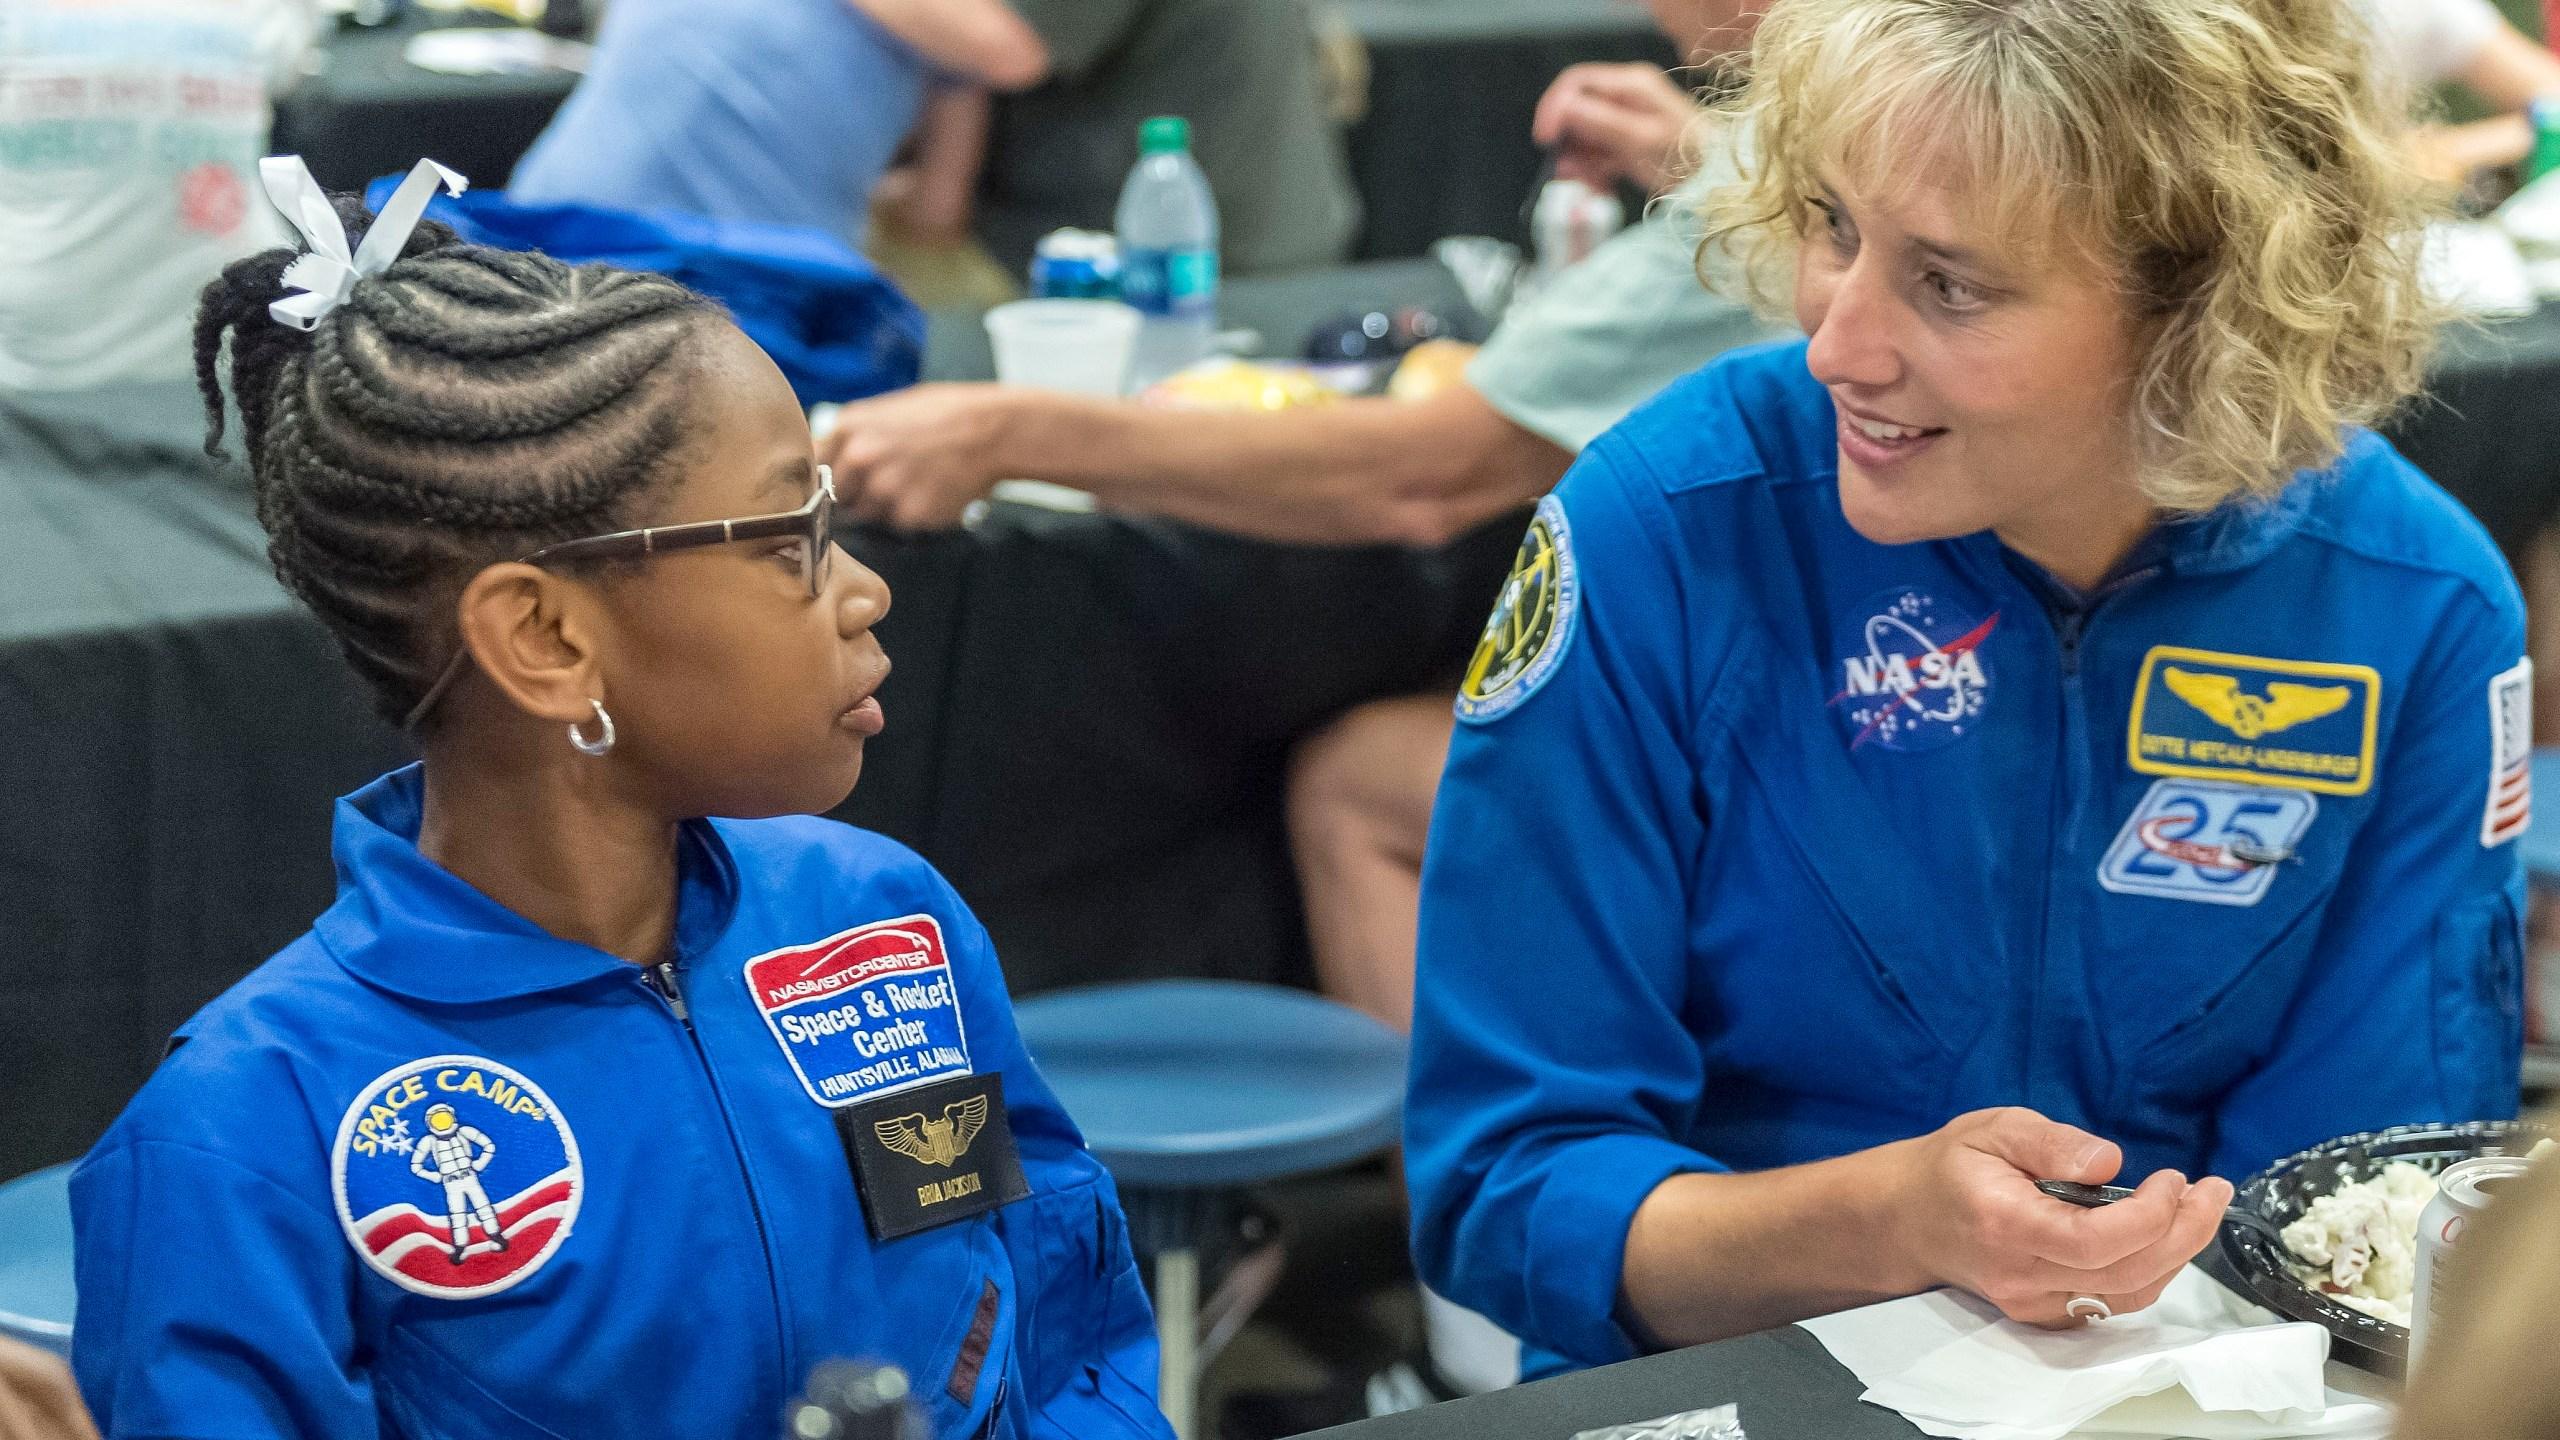 Travel: Huntsville, Ala - U.S. Space & Rocket Center